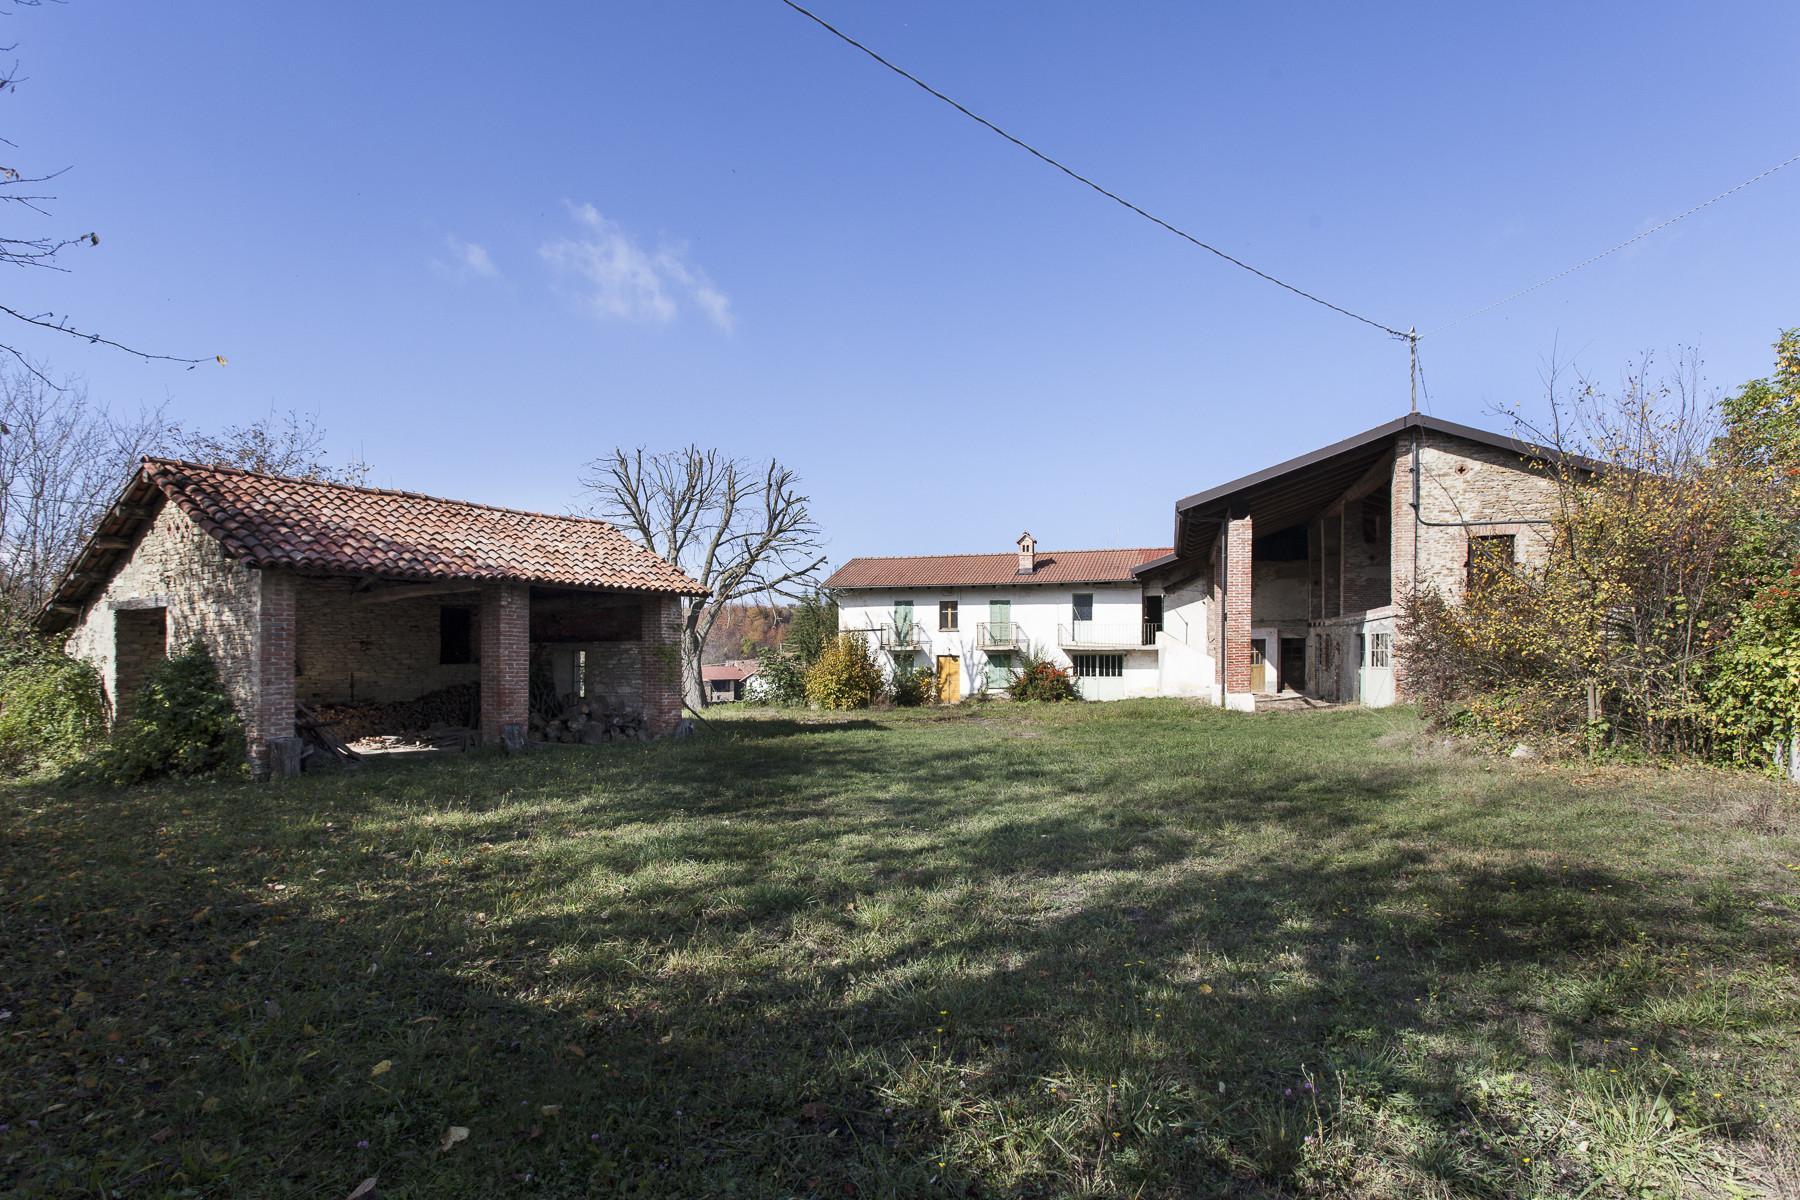 Villa in Vendita a Clavesana: 5 locali, 1130 mq - Foto 13